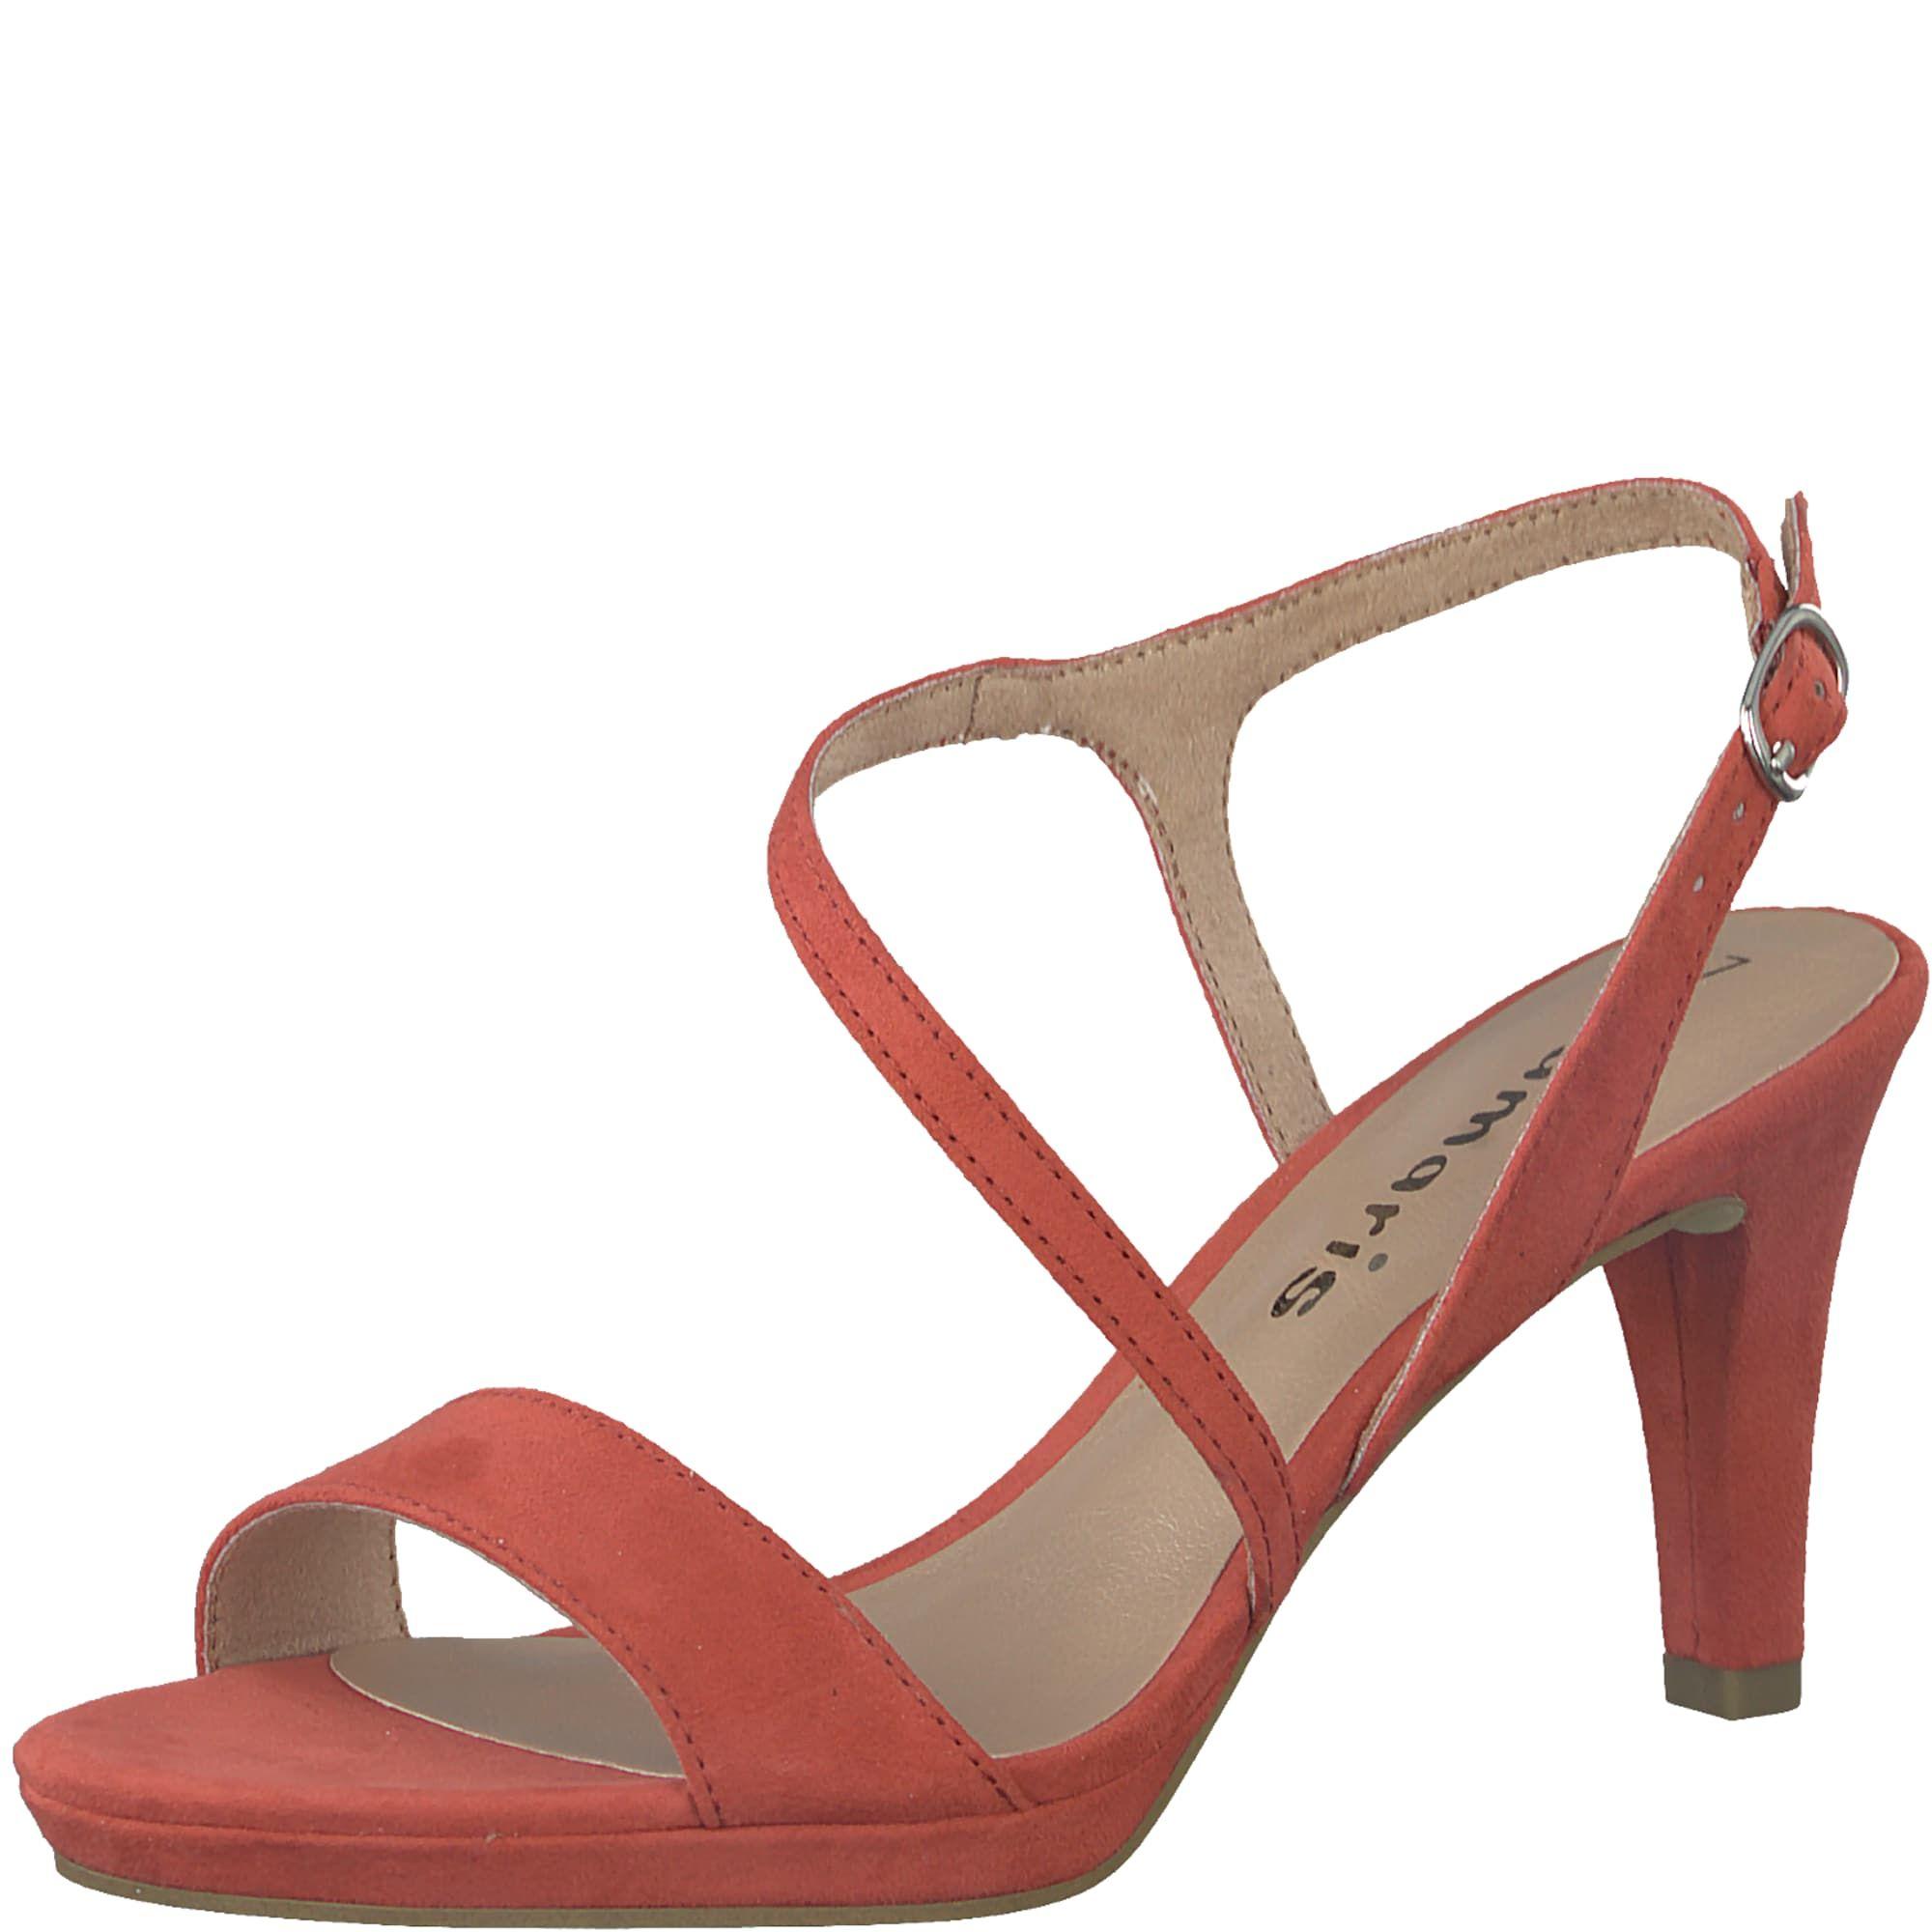 Sandale ´Sandal asymmetrisch´